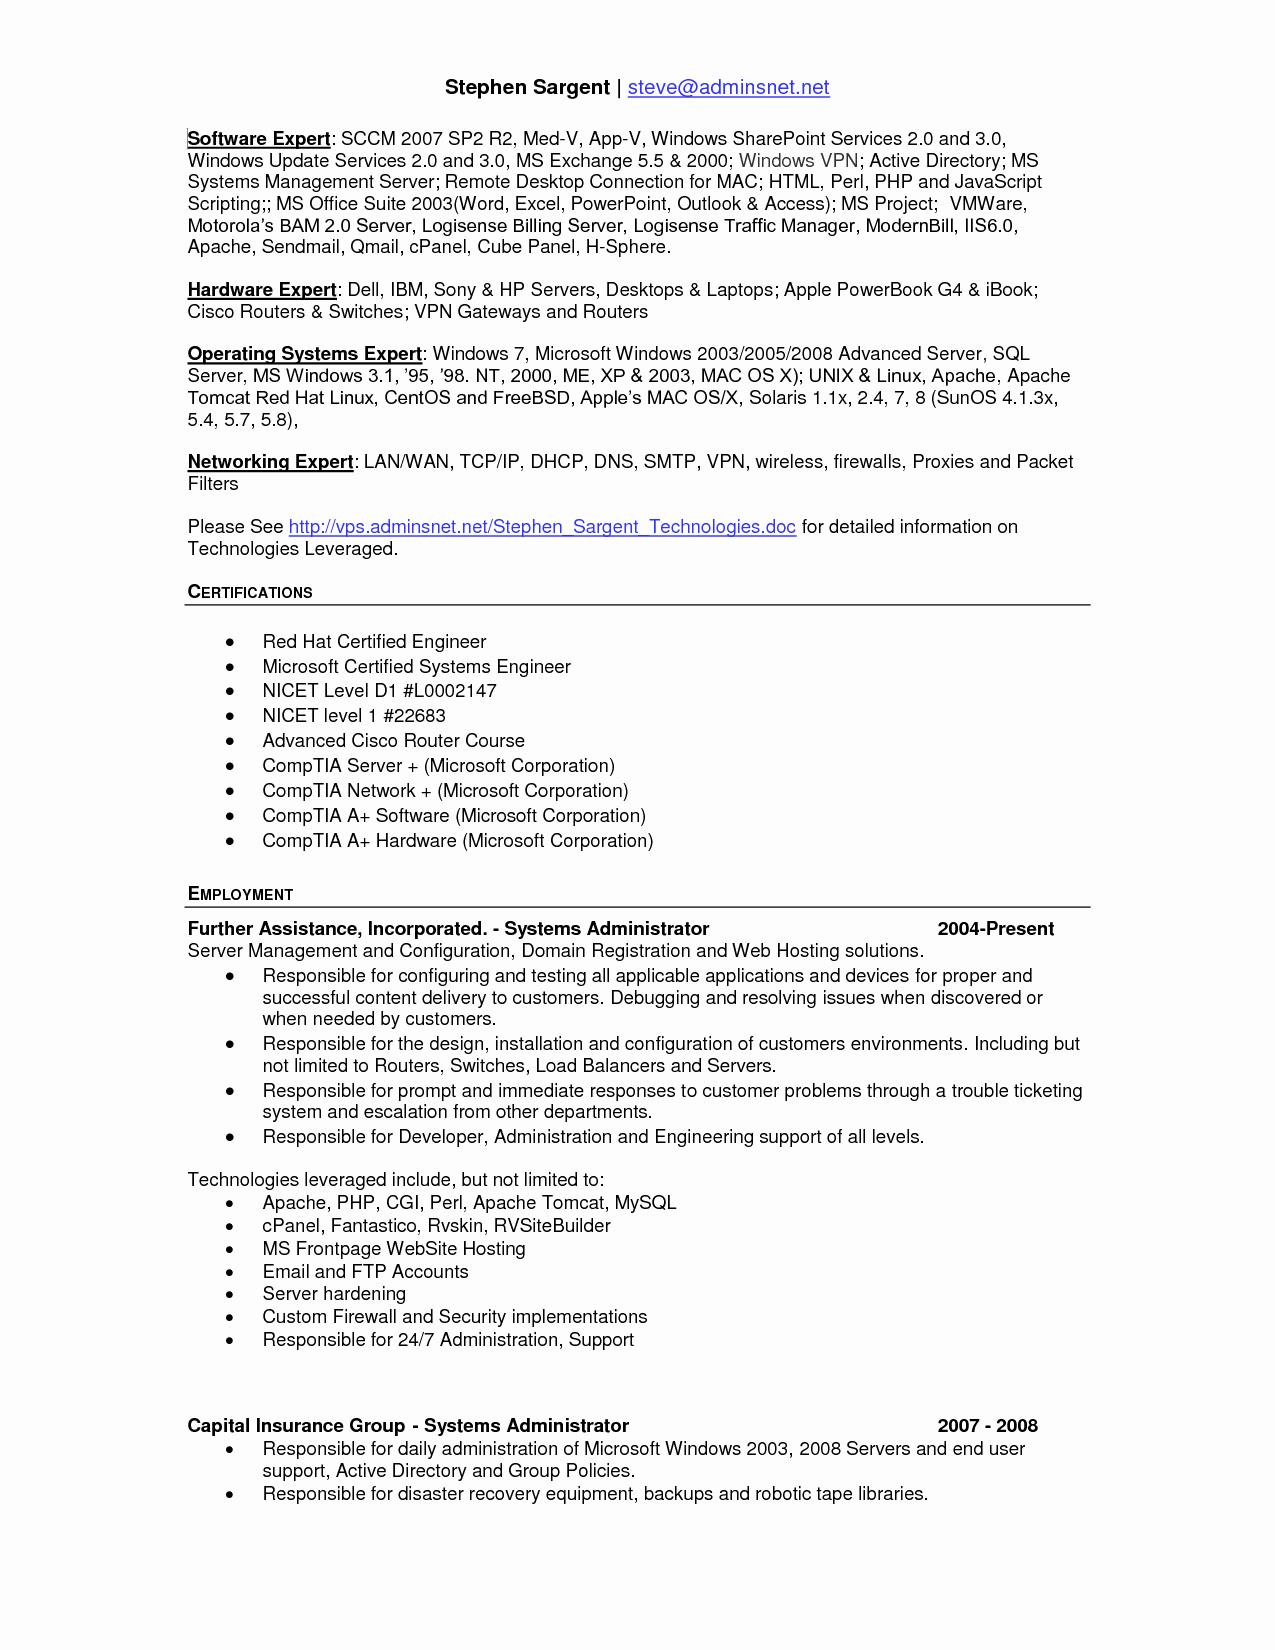 Resume Microsoft Word Mac Wwwomoalata Microsoft Fice